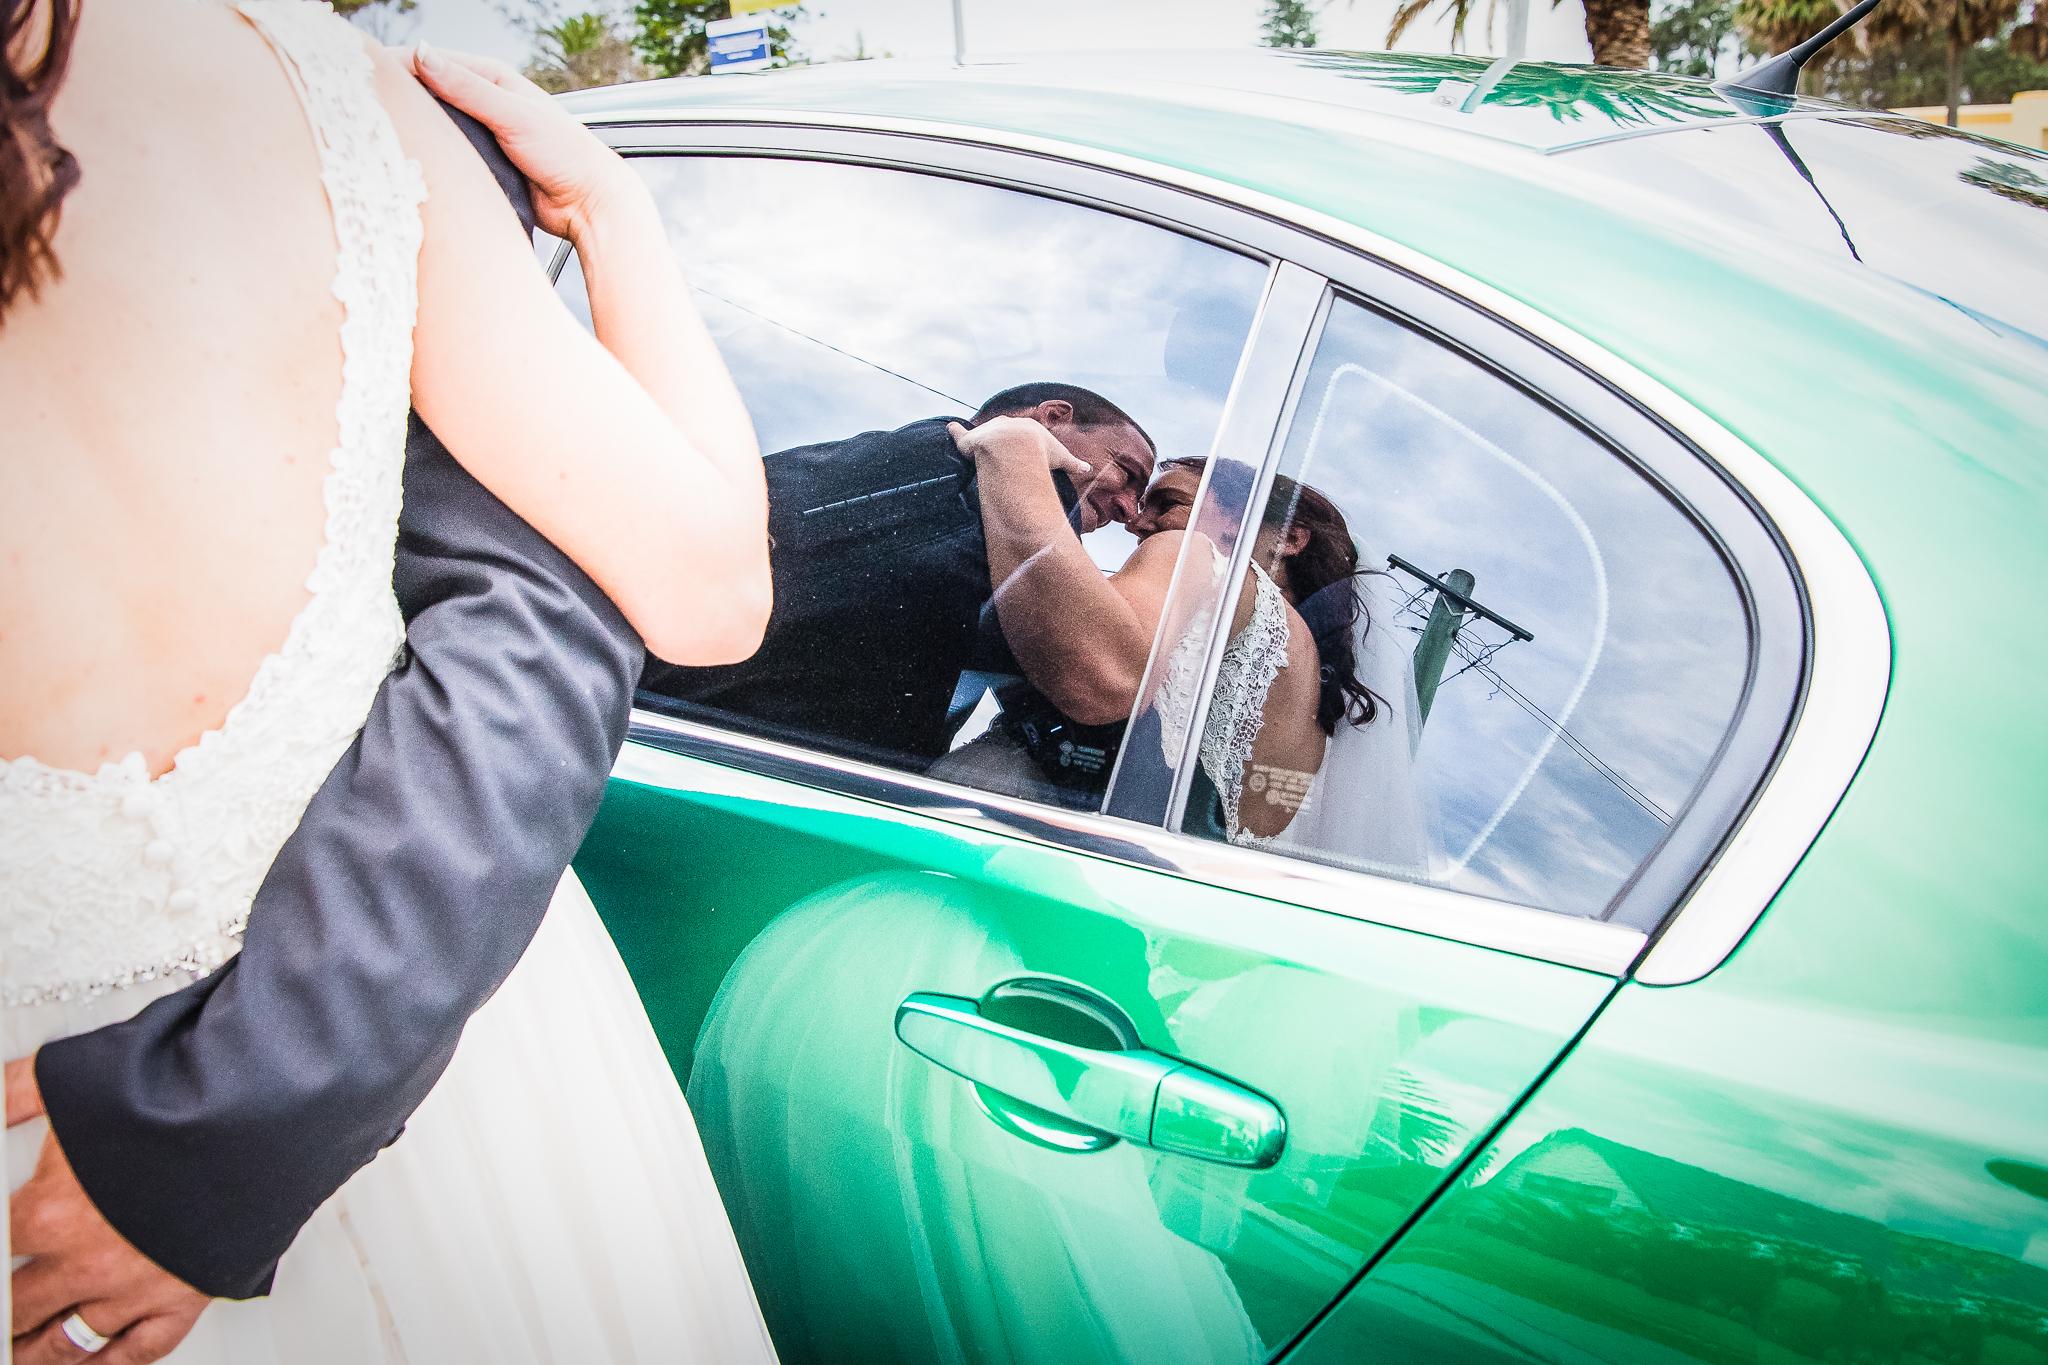 fun wedding photography of reflection in car window